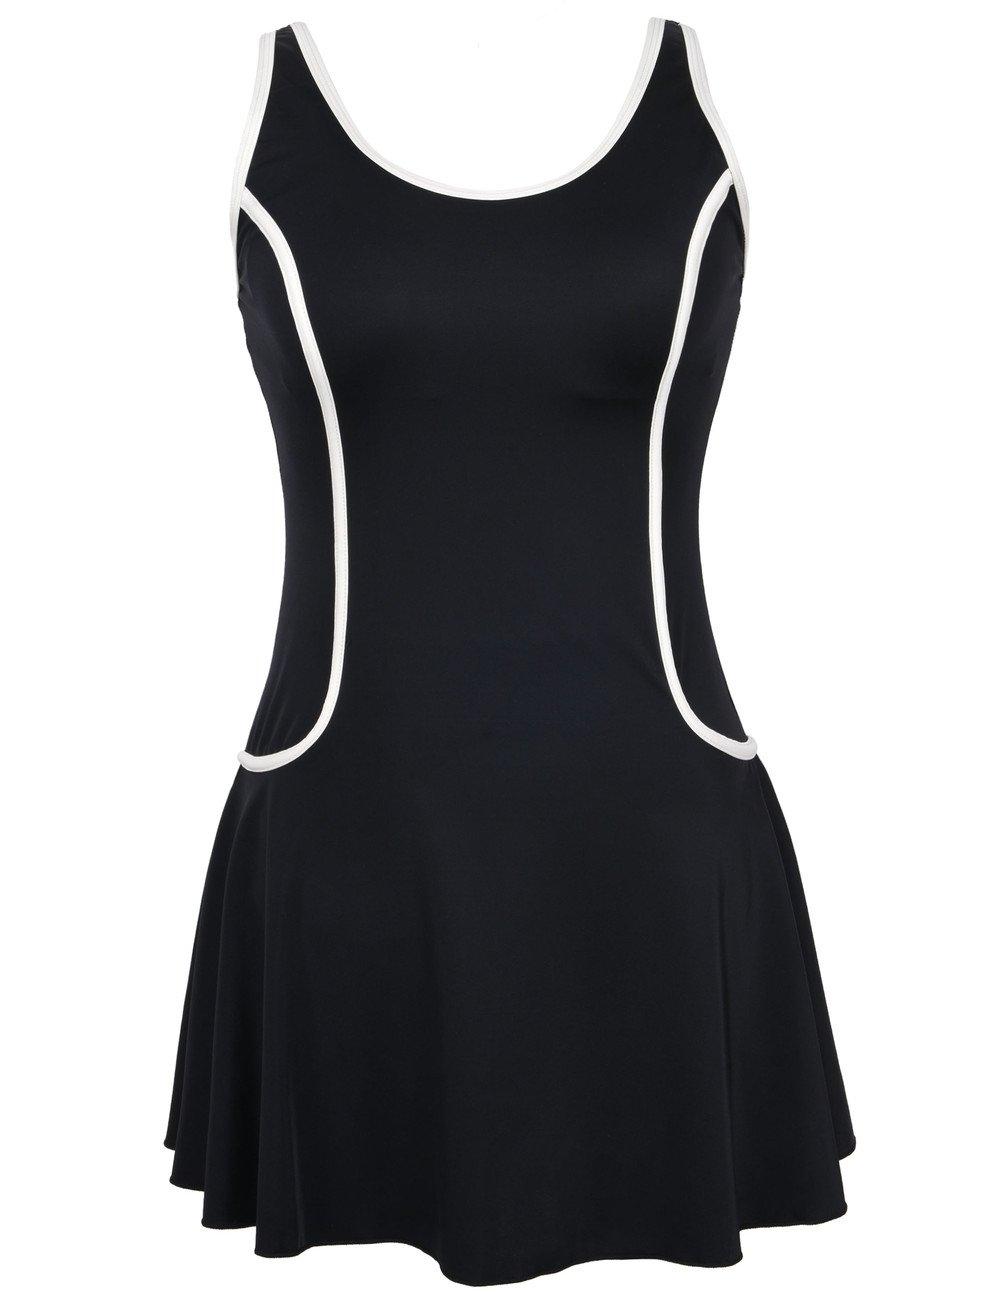 Black&white US 18 Septangle Women's Swimdress Slimming Bathing Suits Tummy Control Swimsuit